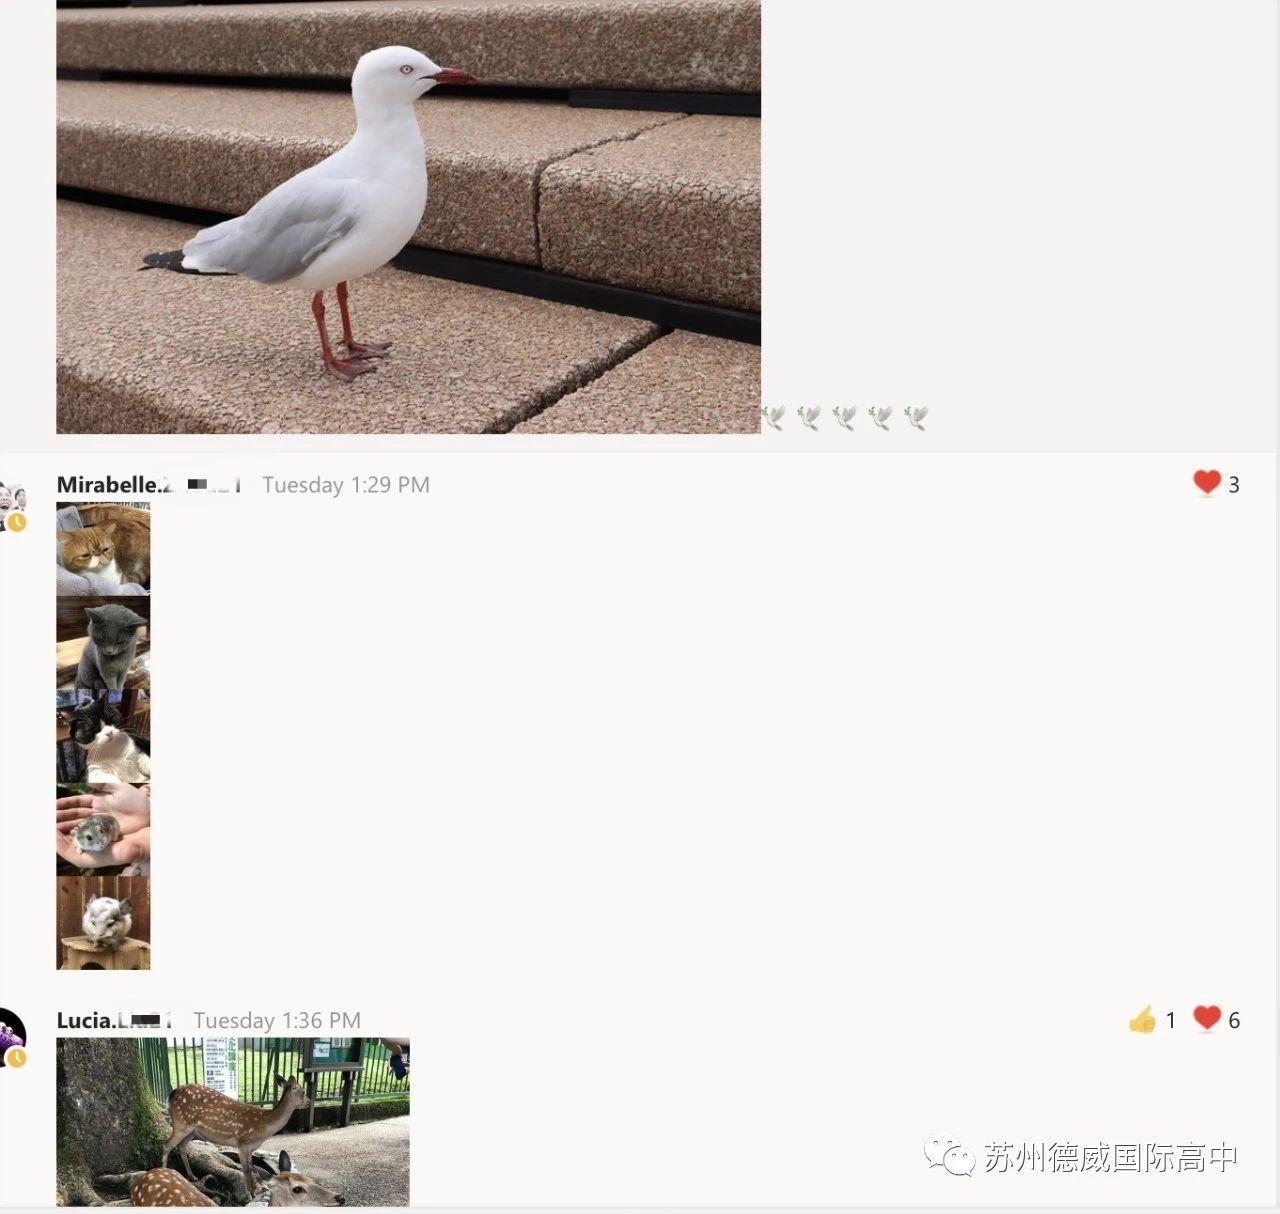 wechat-image-20200311083600-Dulwich_International_High_School_Suzhou